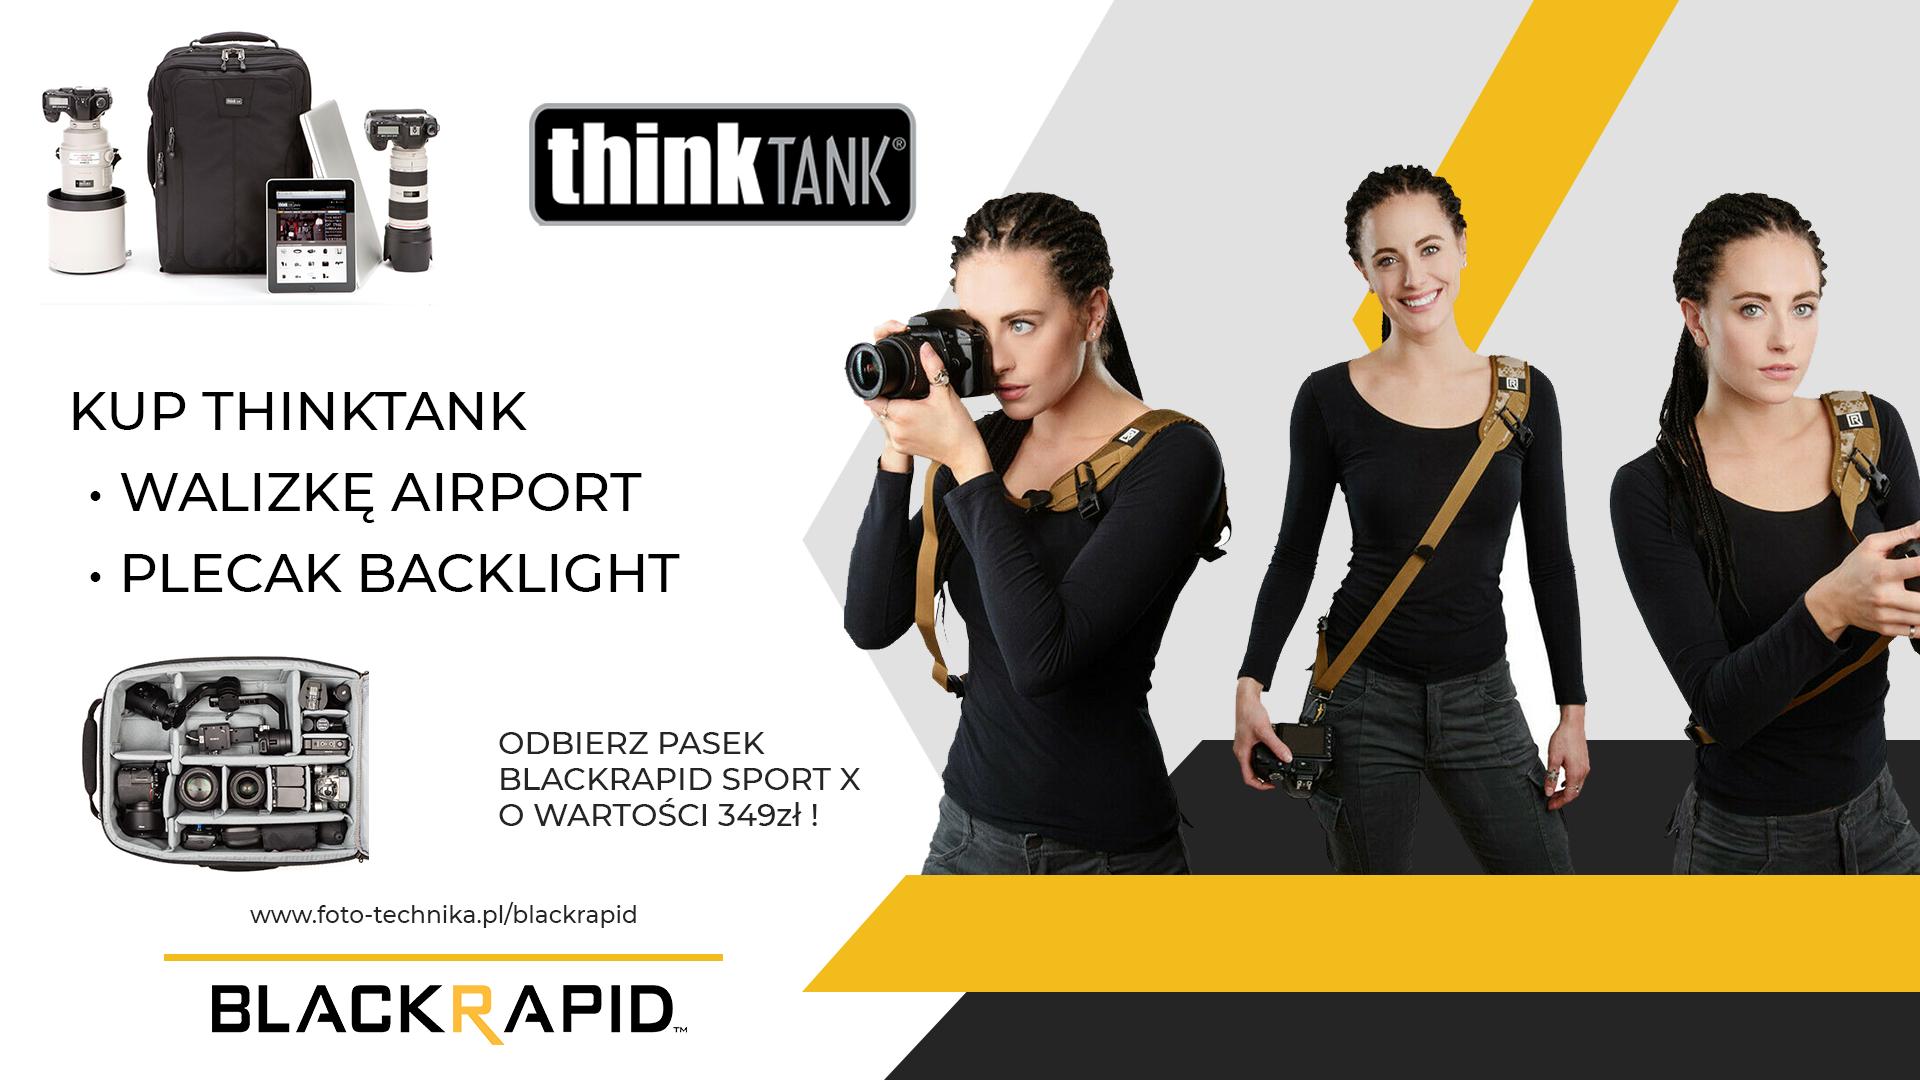 ThinkTank_wersja_1_poziom.png